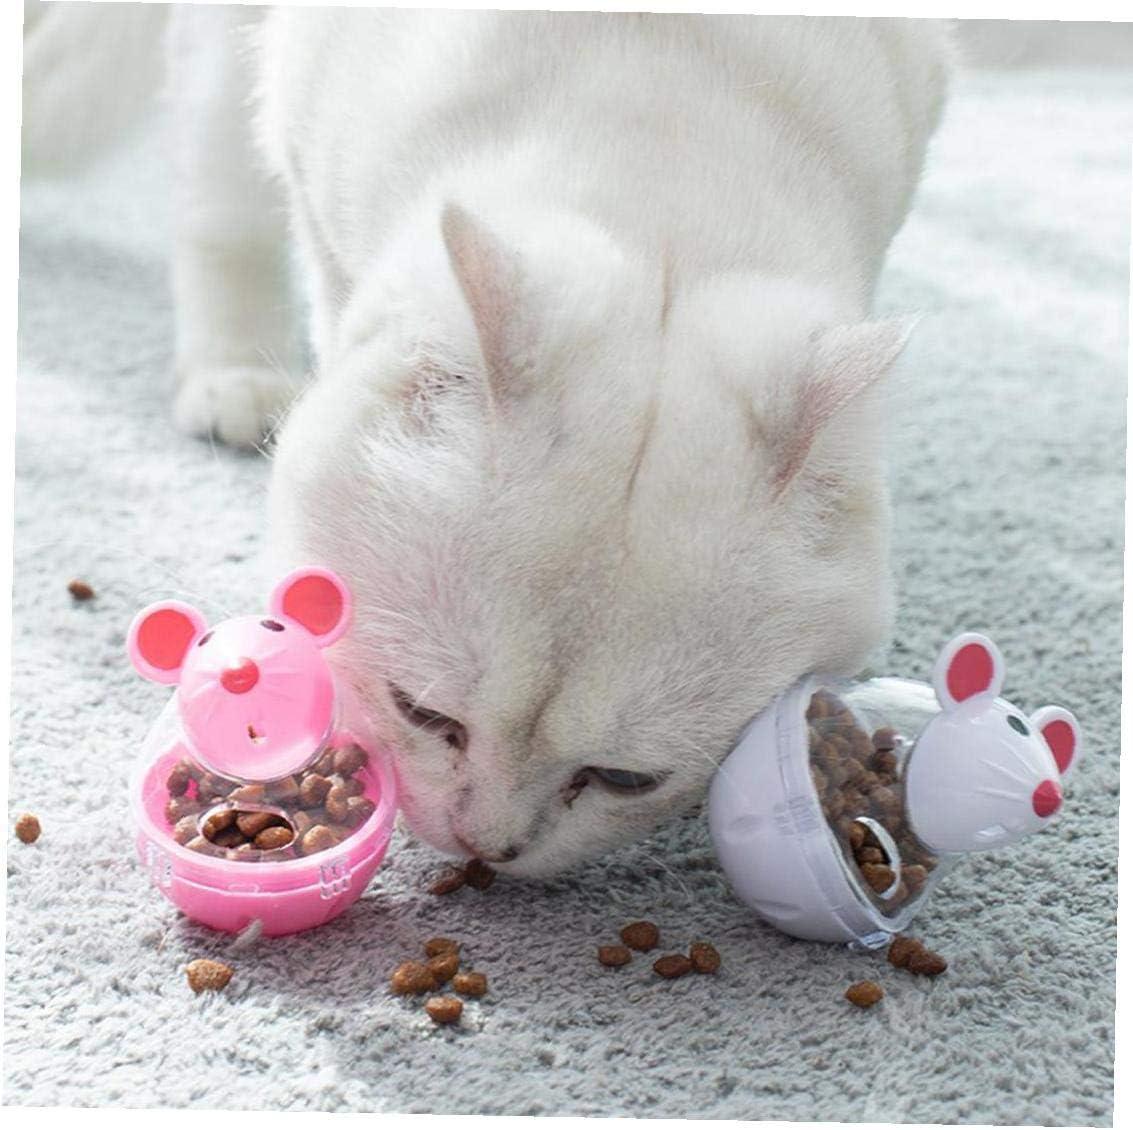 Screst Bola del Rat/ón del Perro Triturador Blanco Dise/ño Interactivo De Capacitaci/ón Iq Juguete para Mascotas Thumbler Comida para Gatos Bola Dispensador